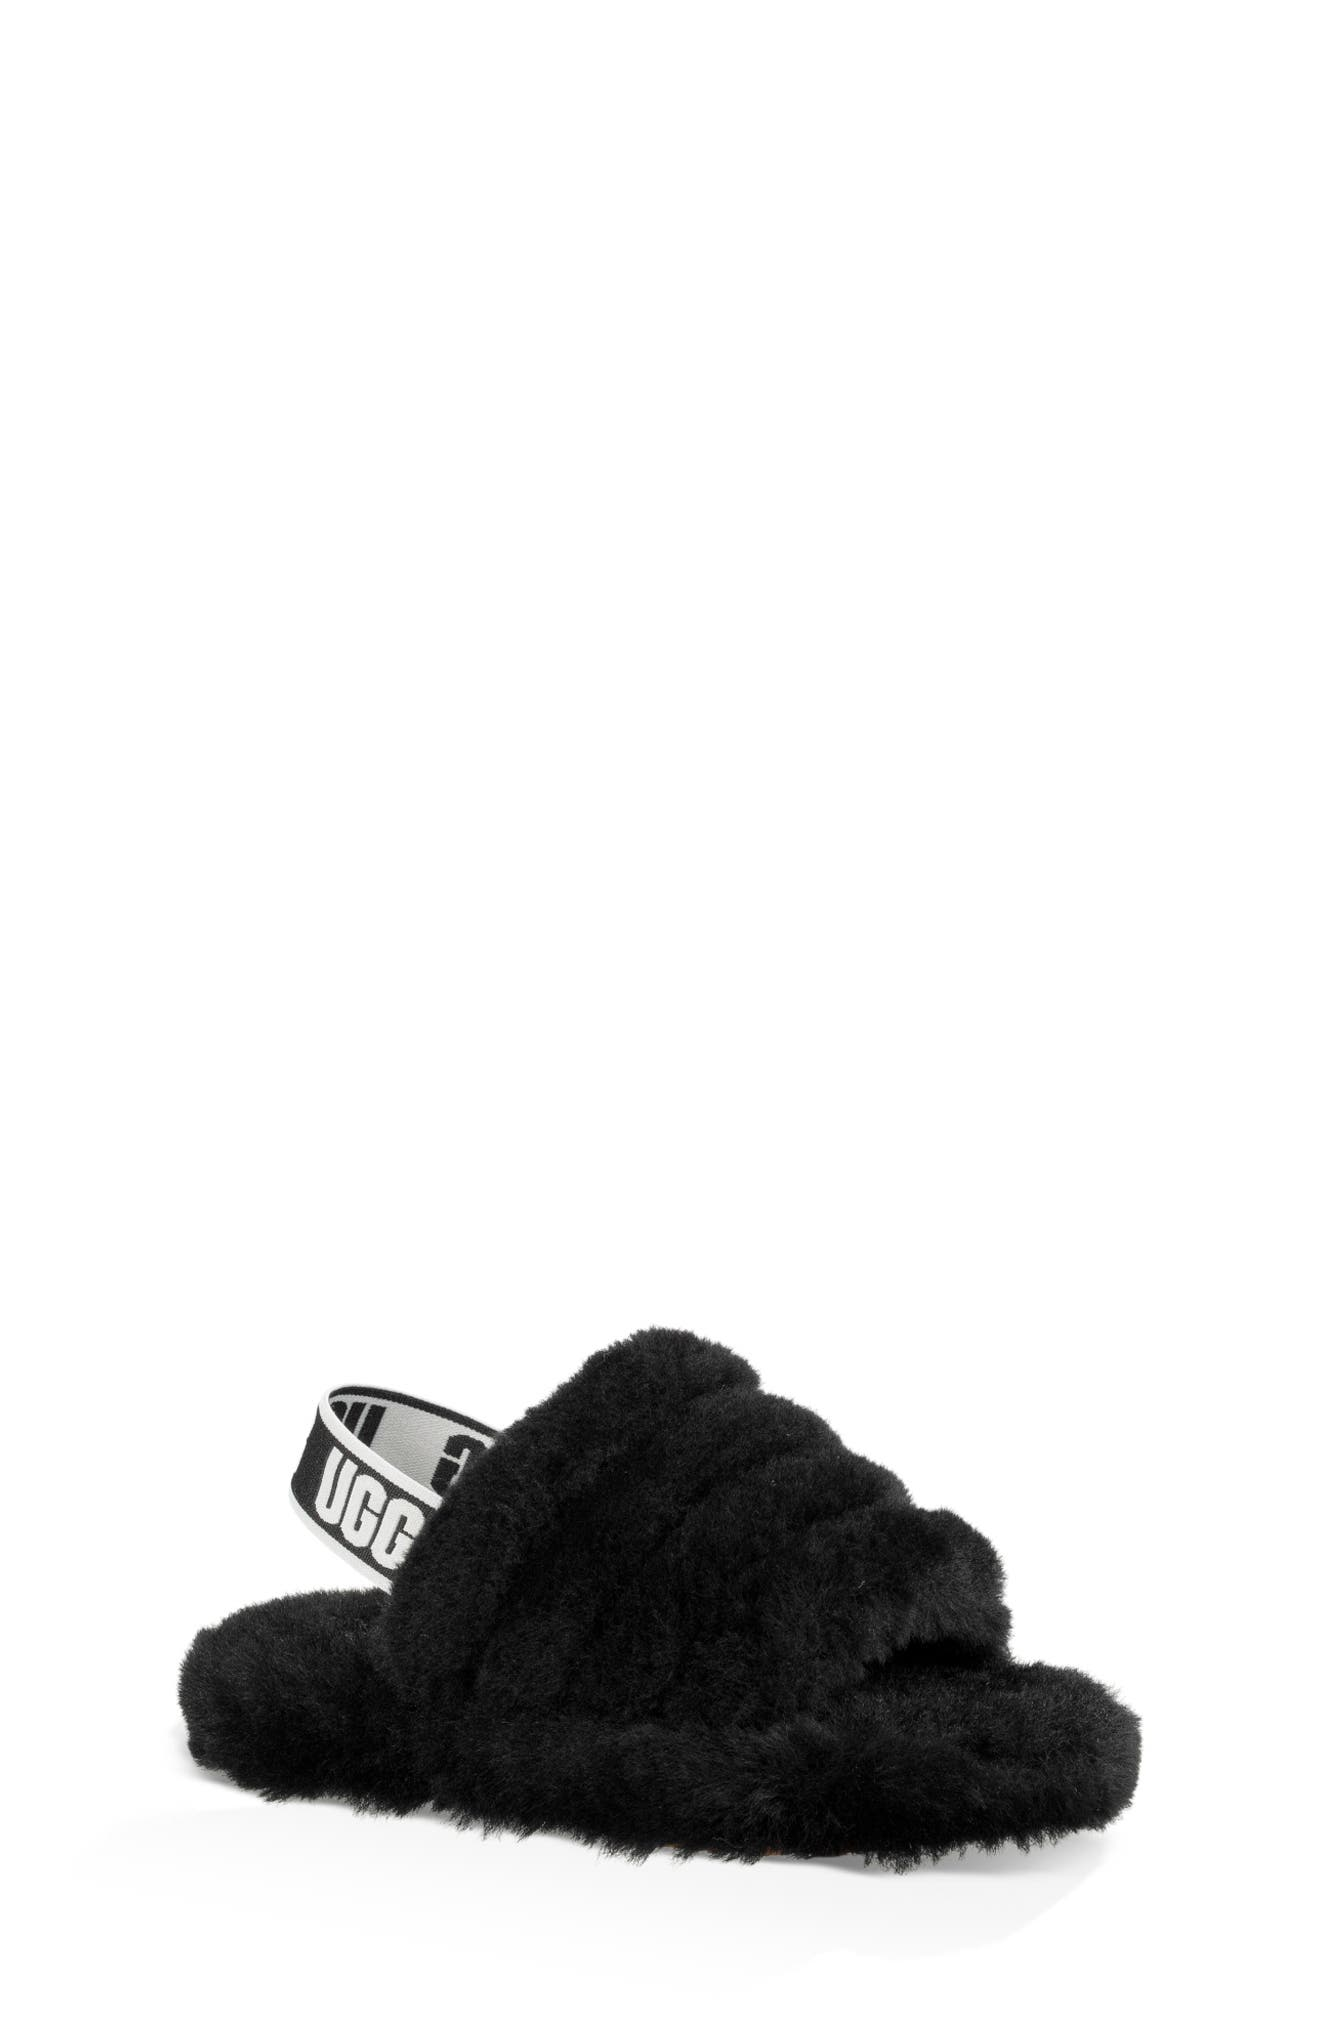 UGG<SUP>®</SUP>, Fluff Yeah Genuine Shearling Slide Sandal, Main thumbnail 1, color, BLACK